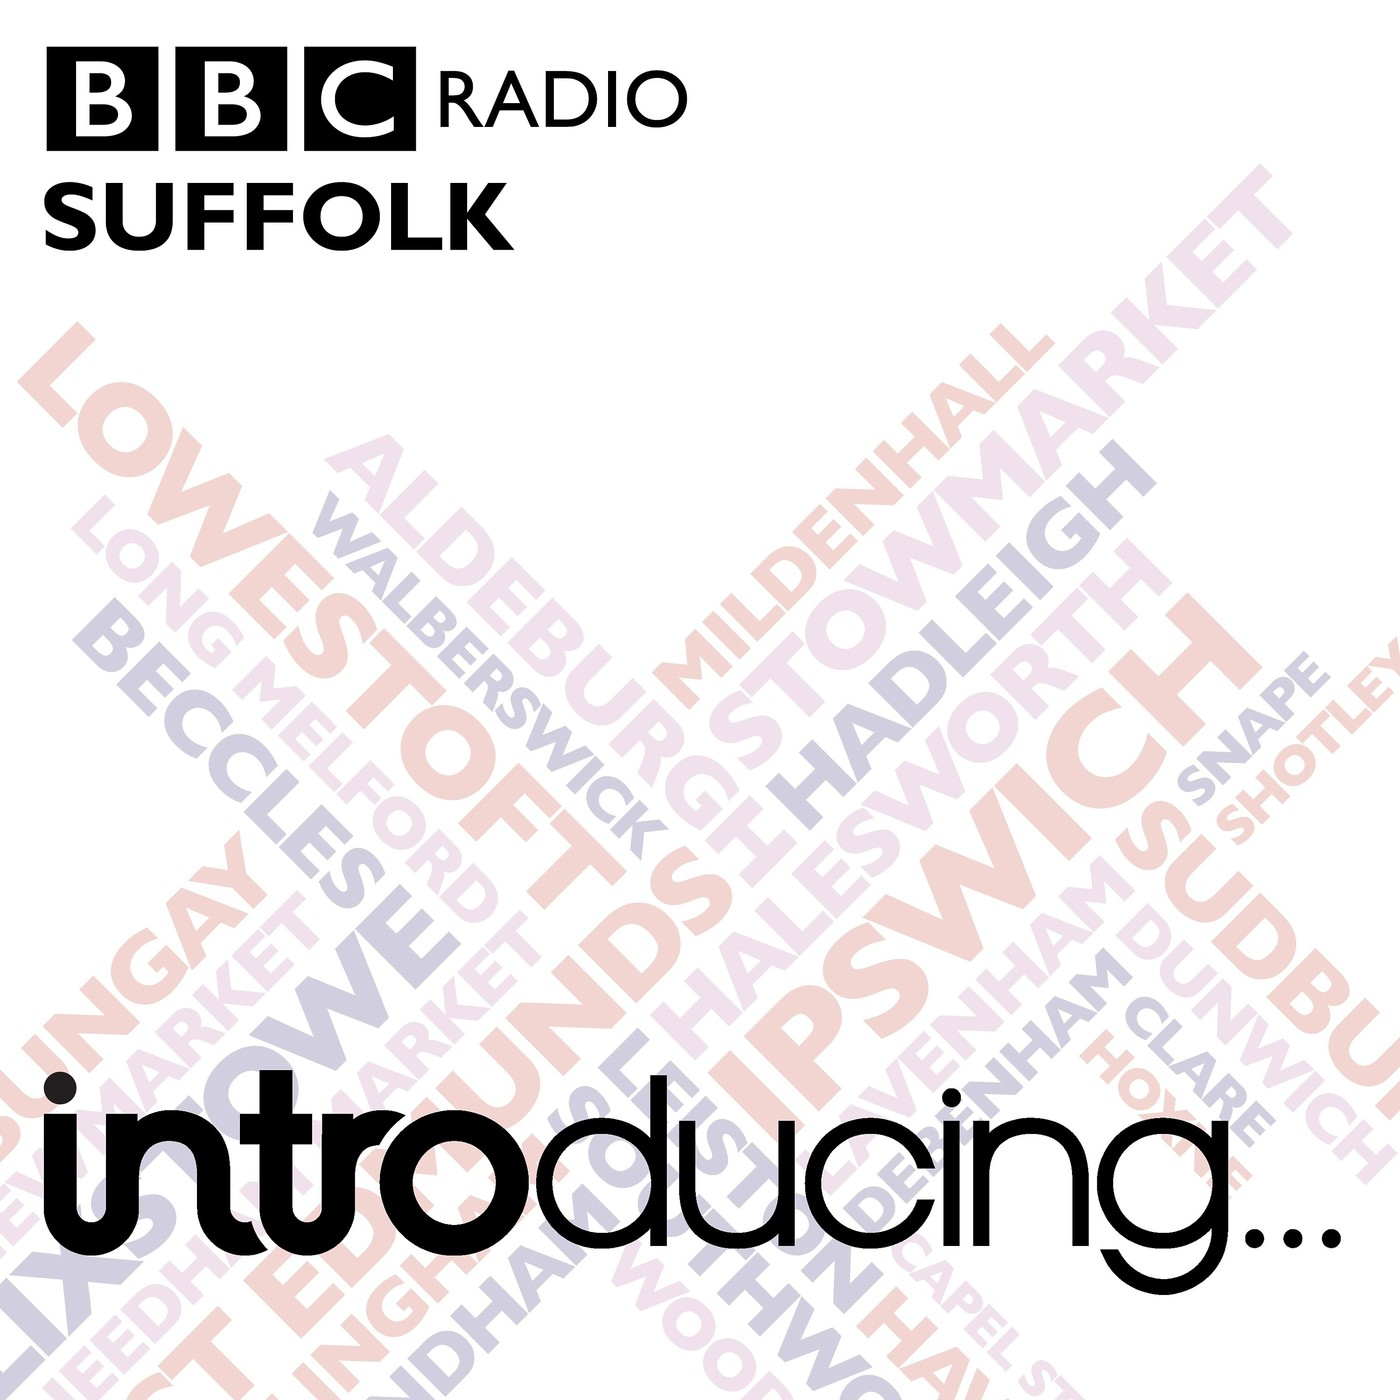 BBC Suffolk Introducing...